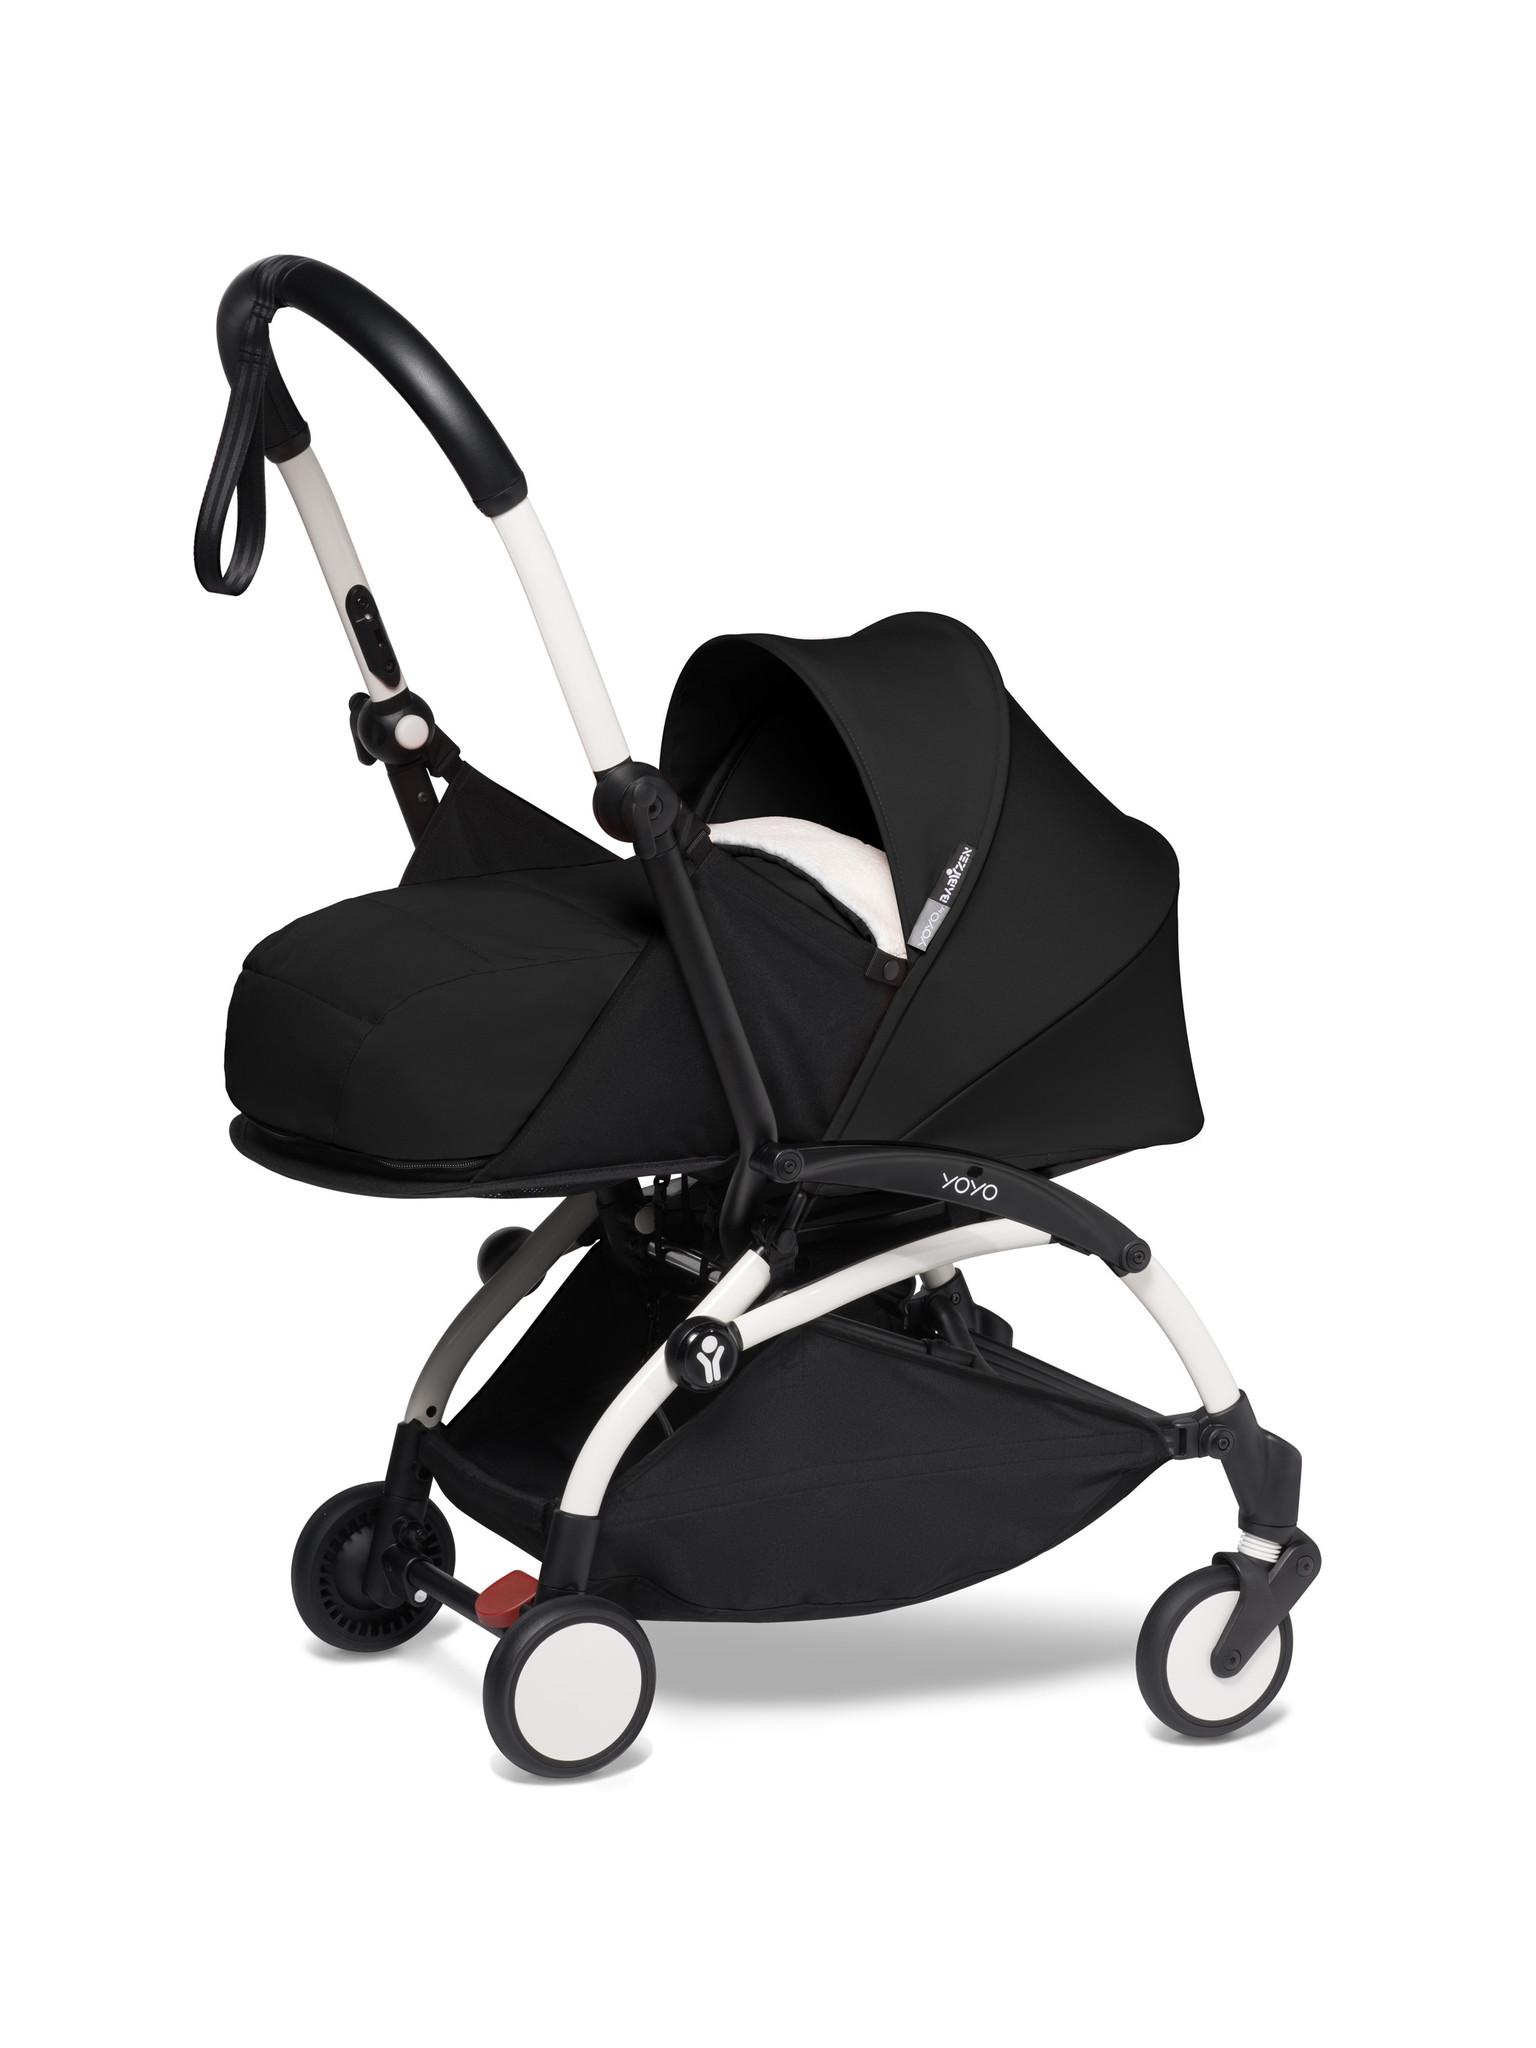 Babyzen Babyzen YOYO² buggy COMPLEET / FULL SET 0+ and 6+ zwart frame wit incl. YOYO² BeSafe autostoel zwart